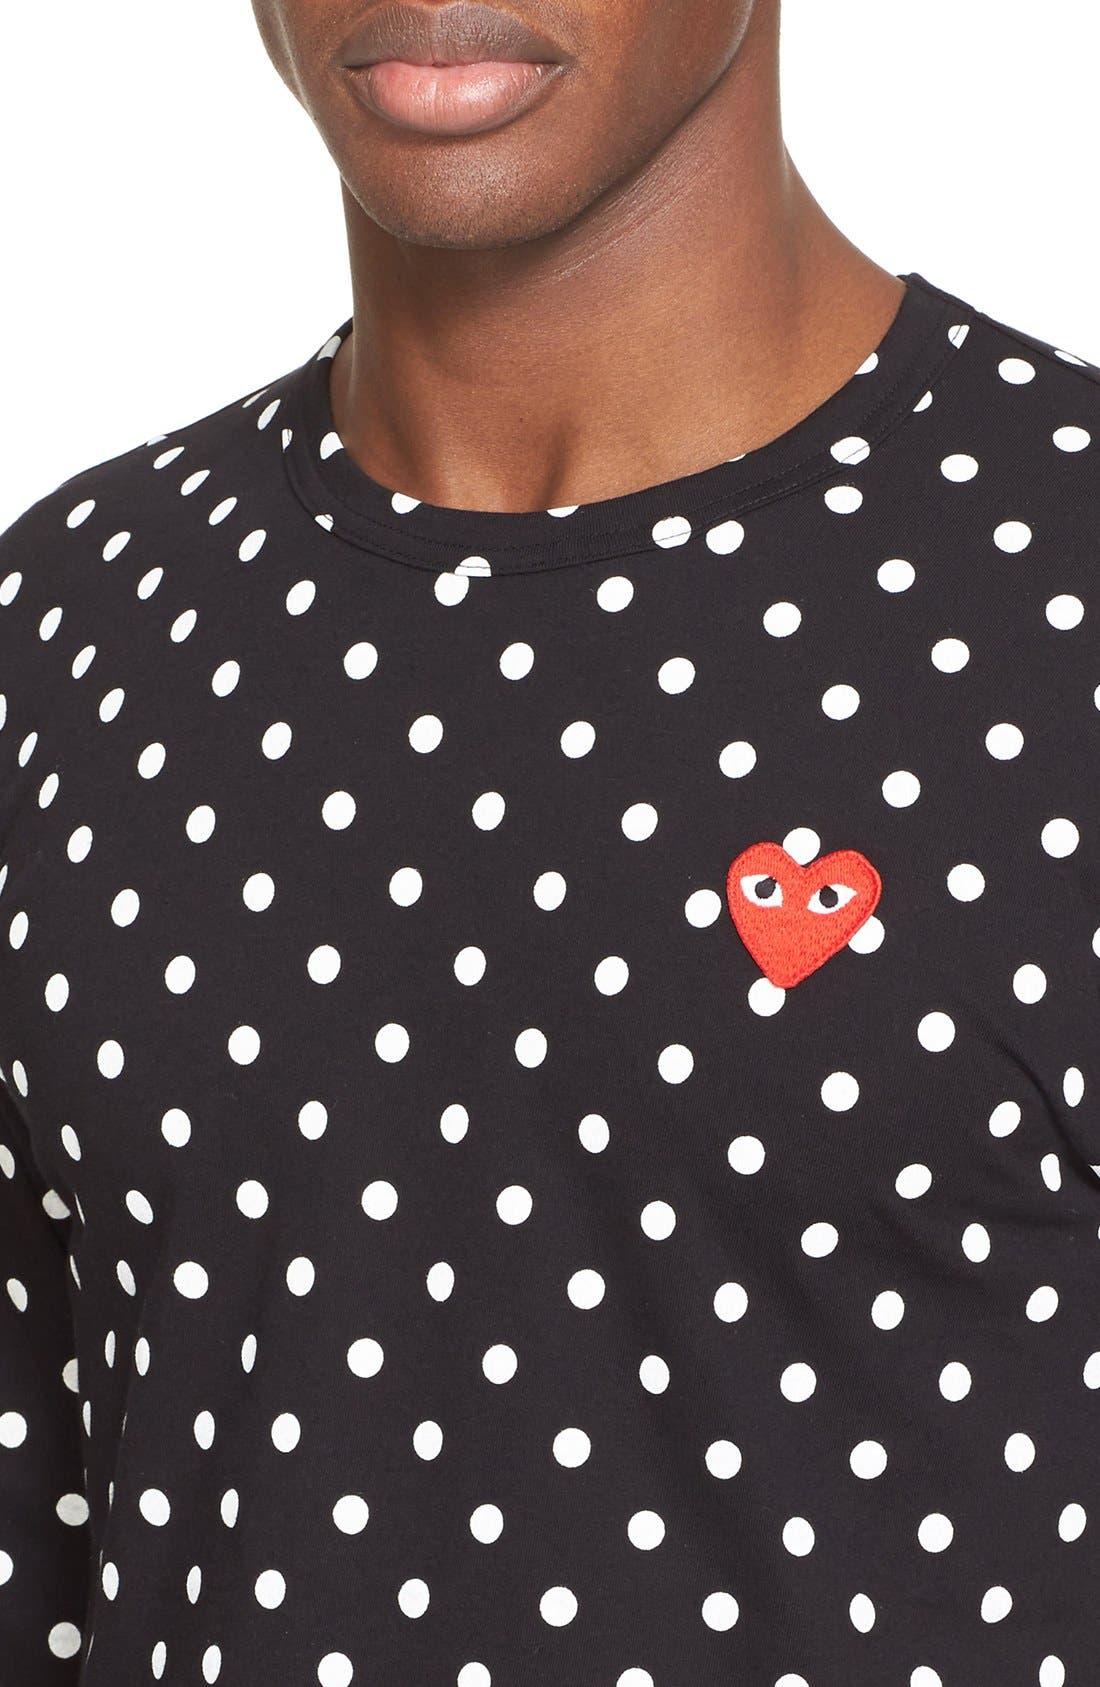 Dot Print Long Sleeve Crewneck T-Shirt,                             Alternate thumbnail 4, color,                             BLACK